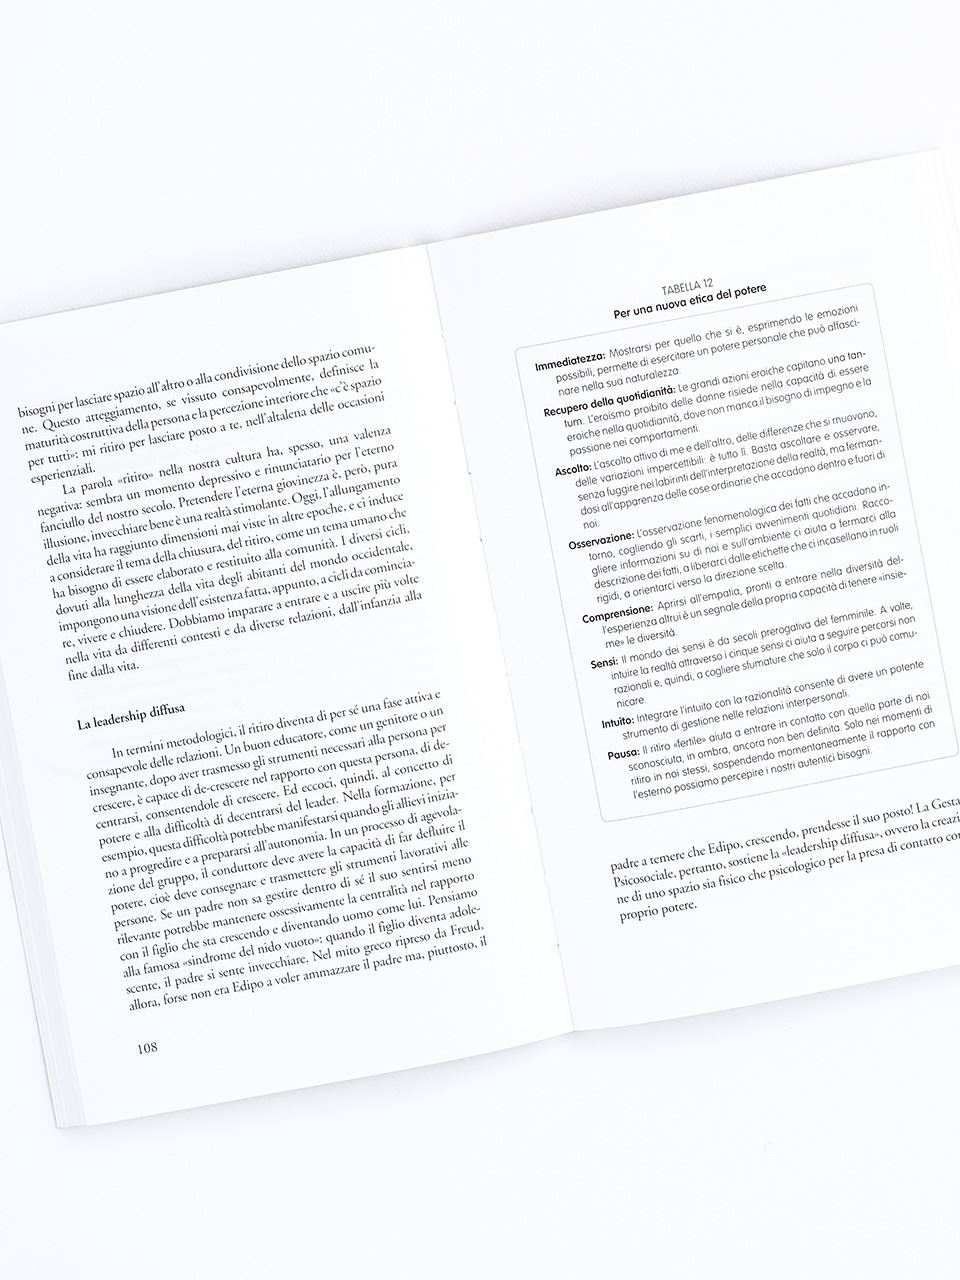 Autostima al femminile - Libri - Erickson 2